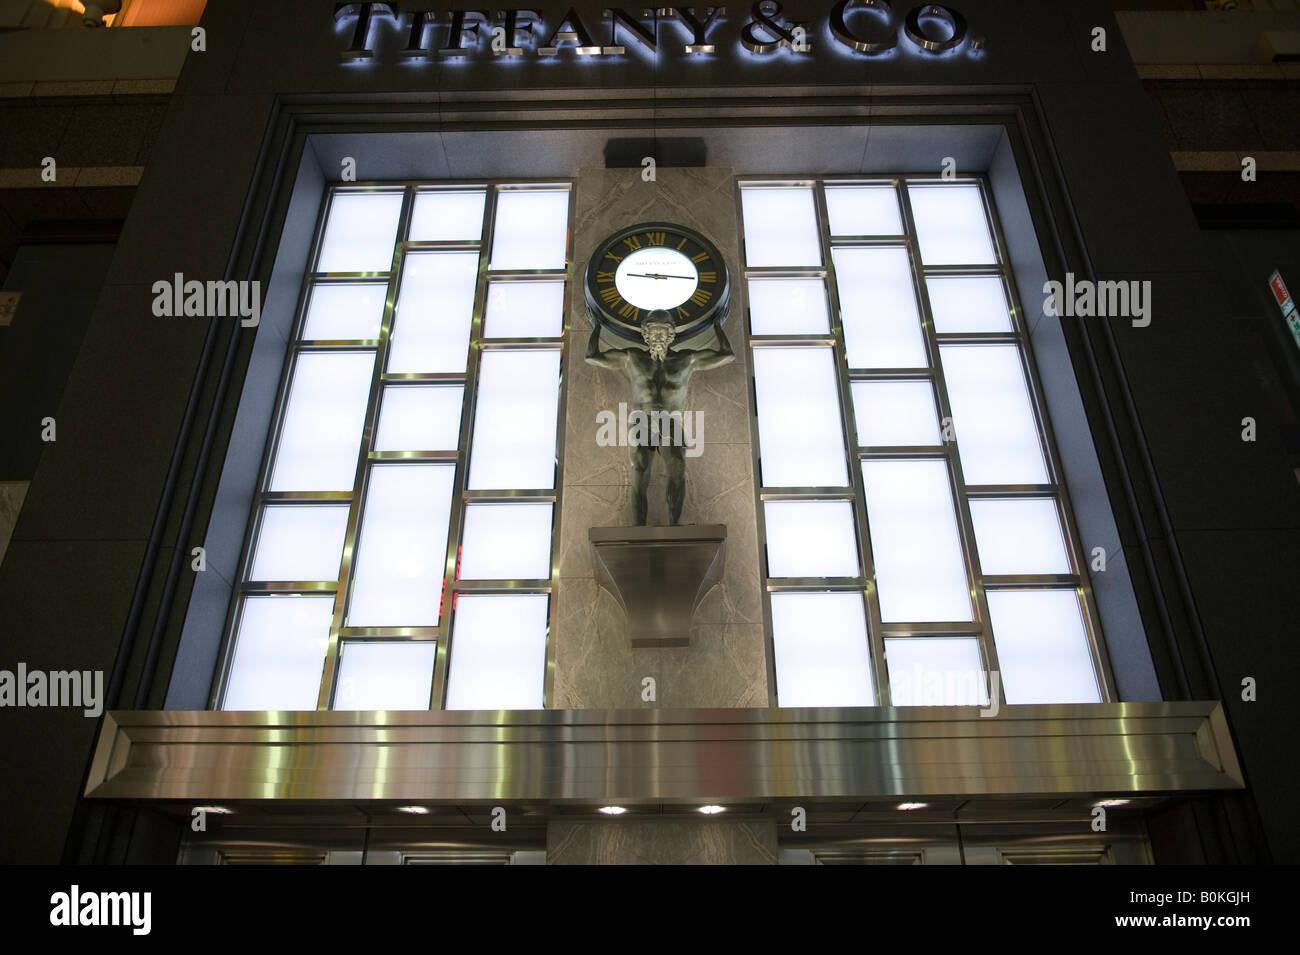 72200e31f japan, Tokyo. Tiffany store on Shinjuku Stock Photo: 17640521 - Alamy